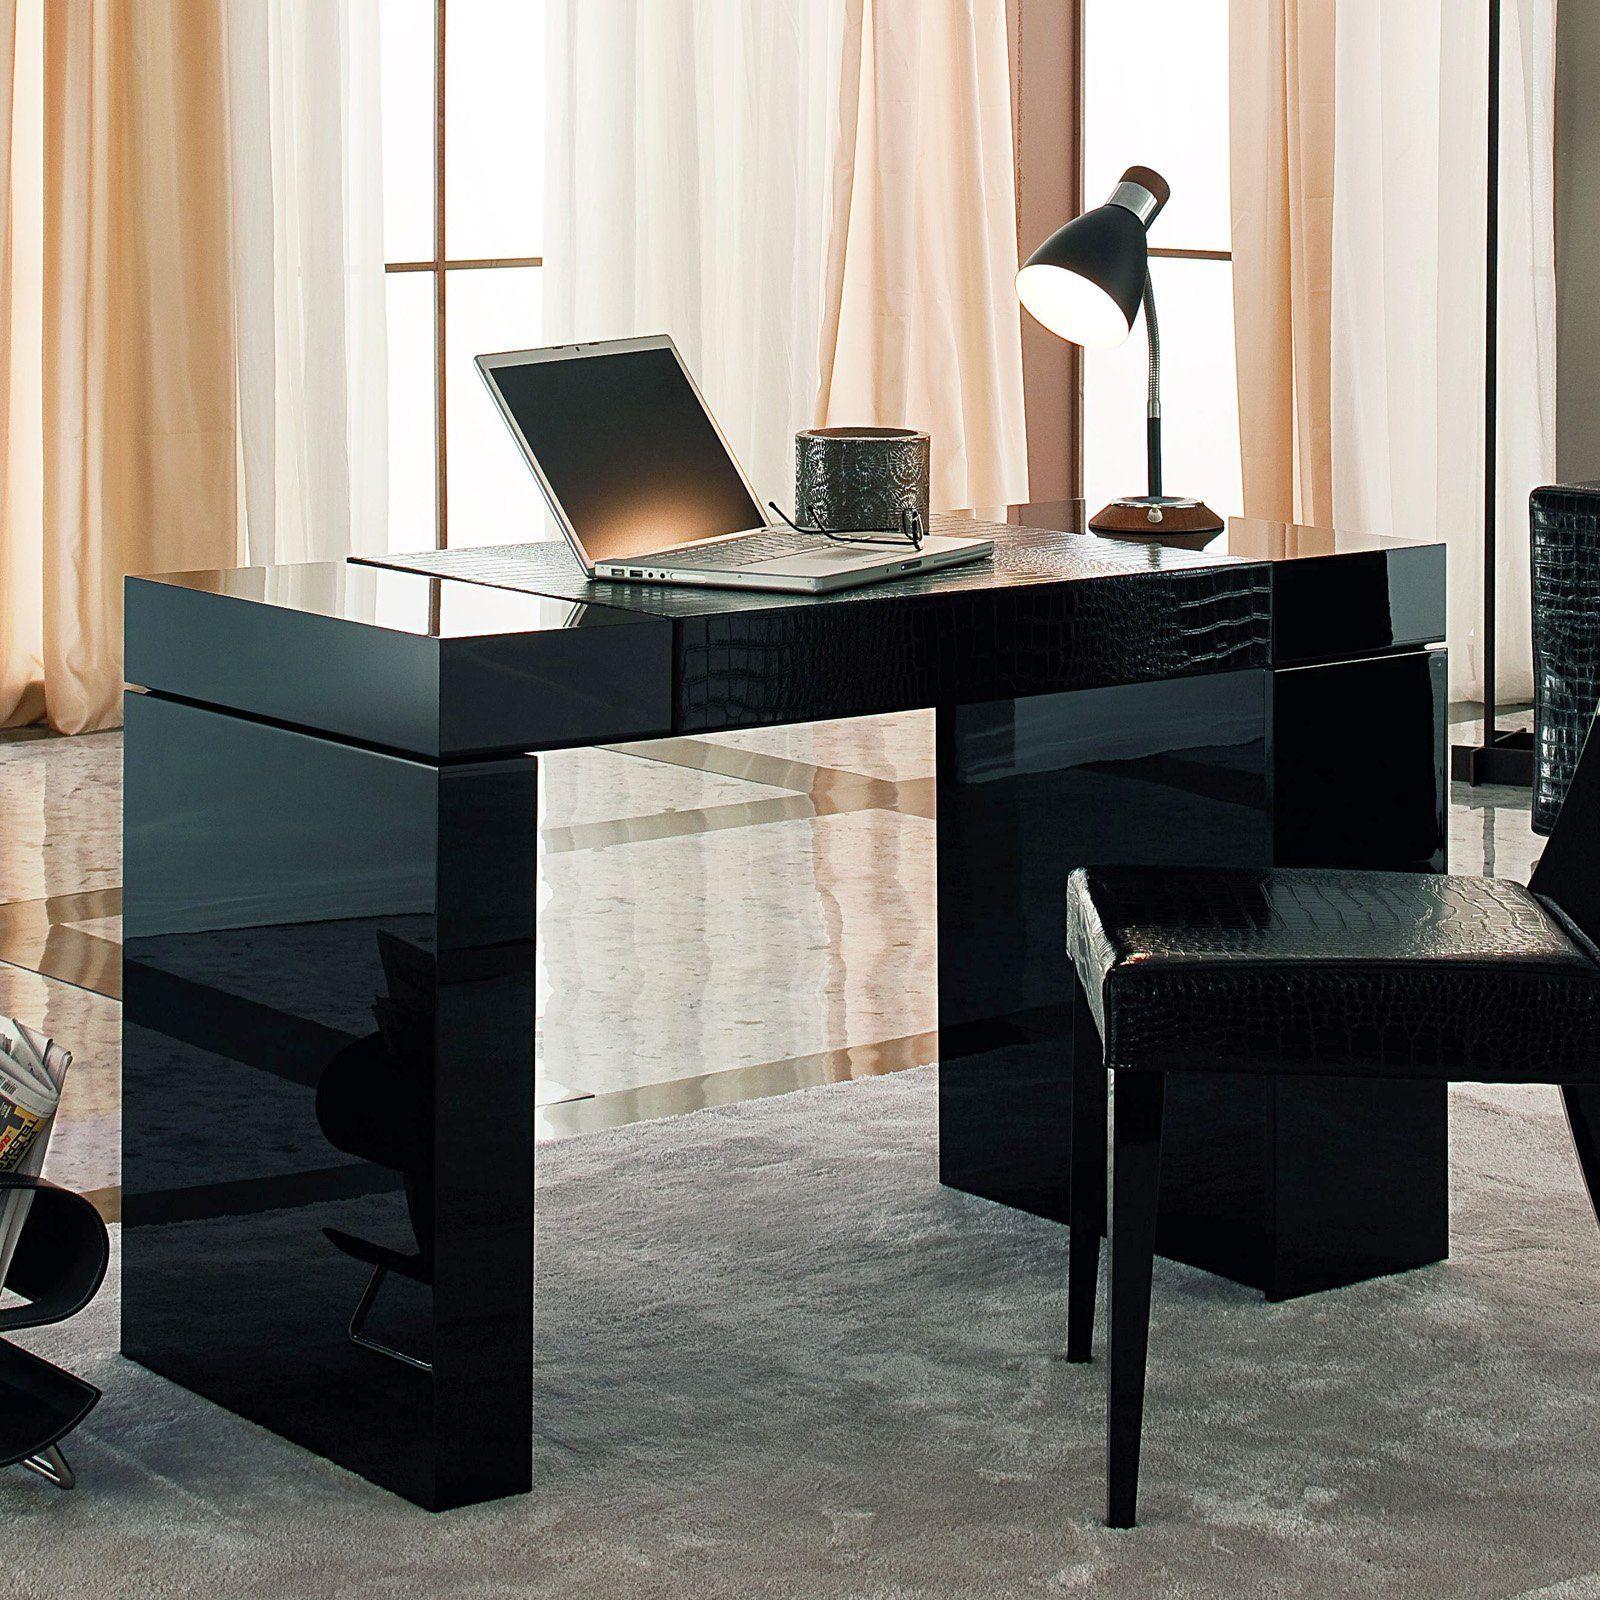 99 Modern Black Desk Home fice Furniture Collections Check more